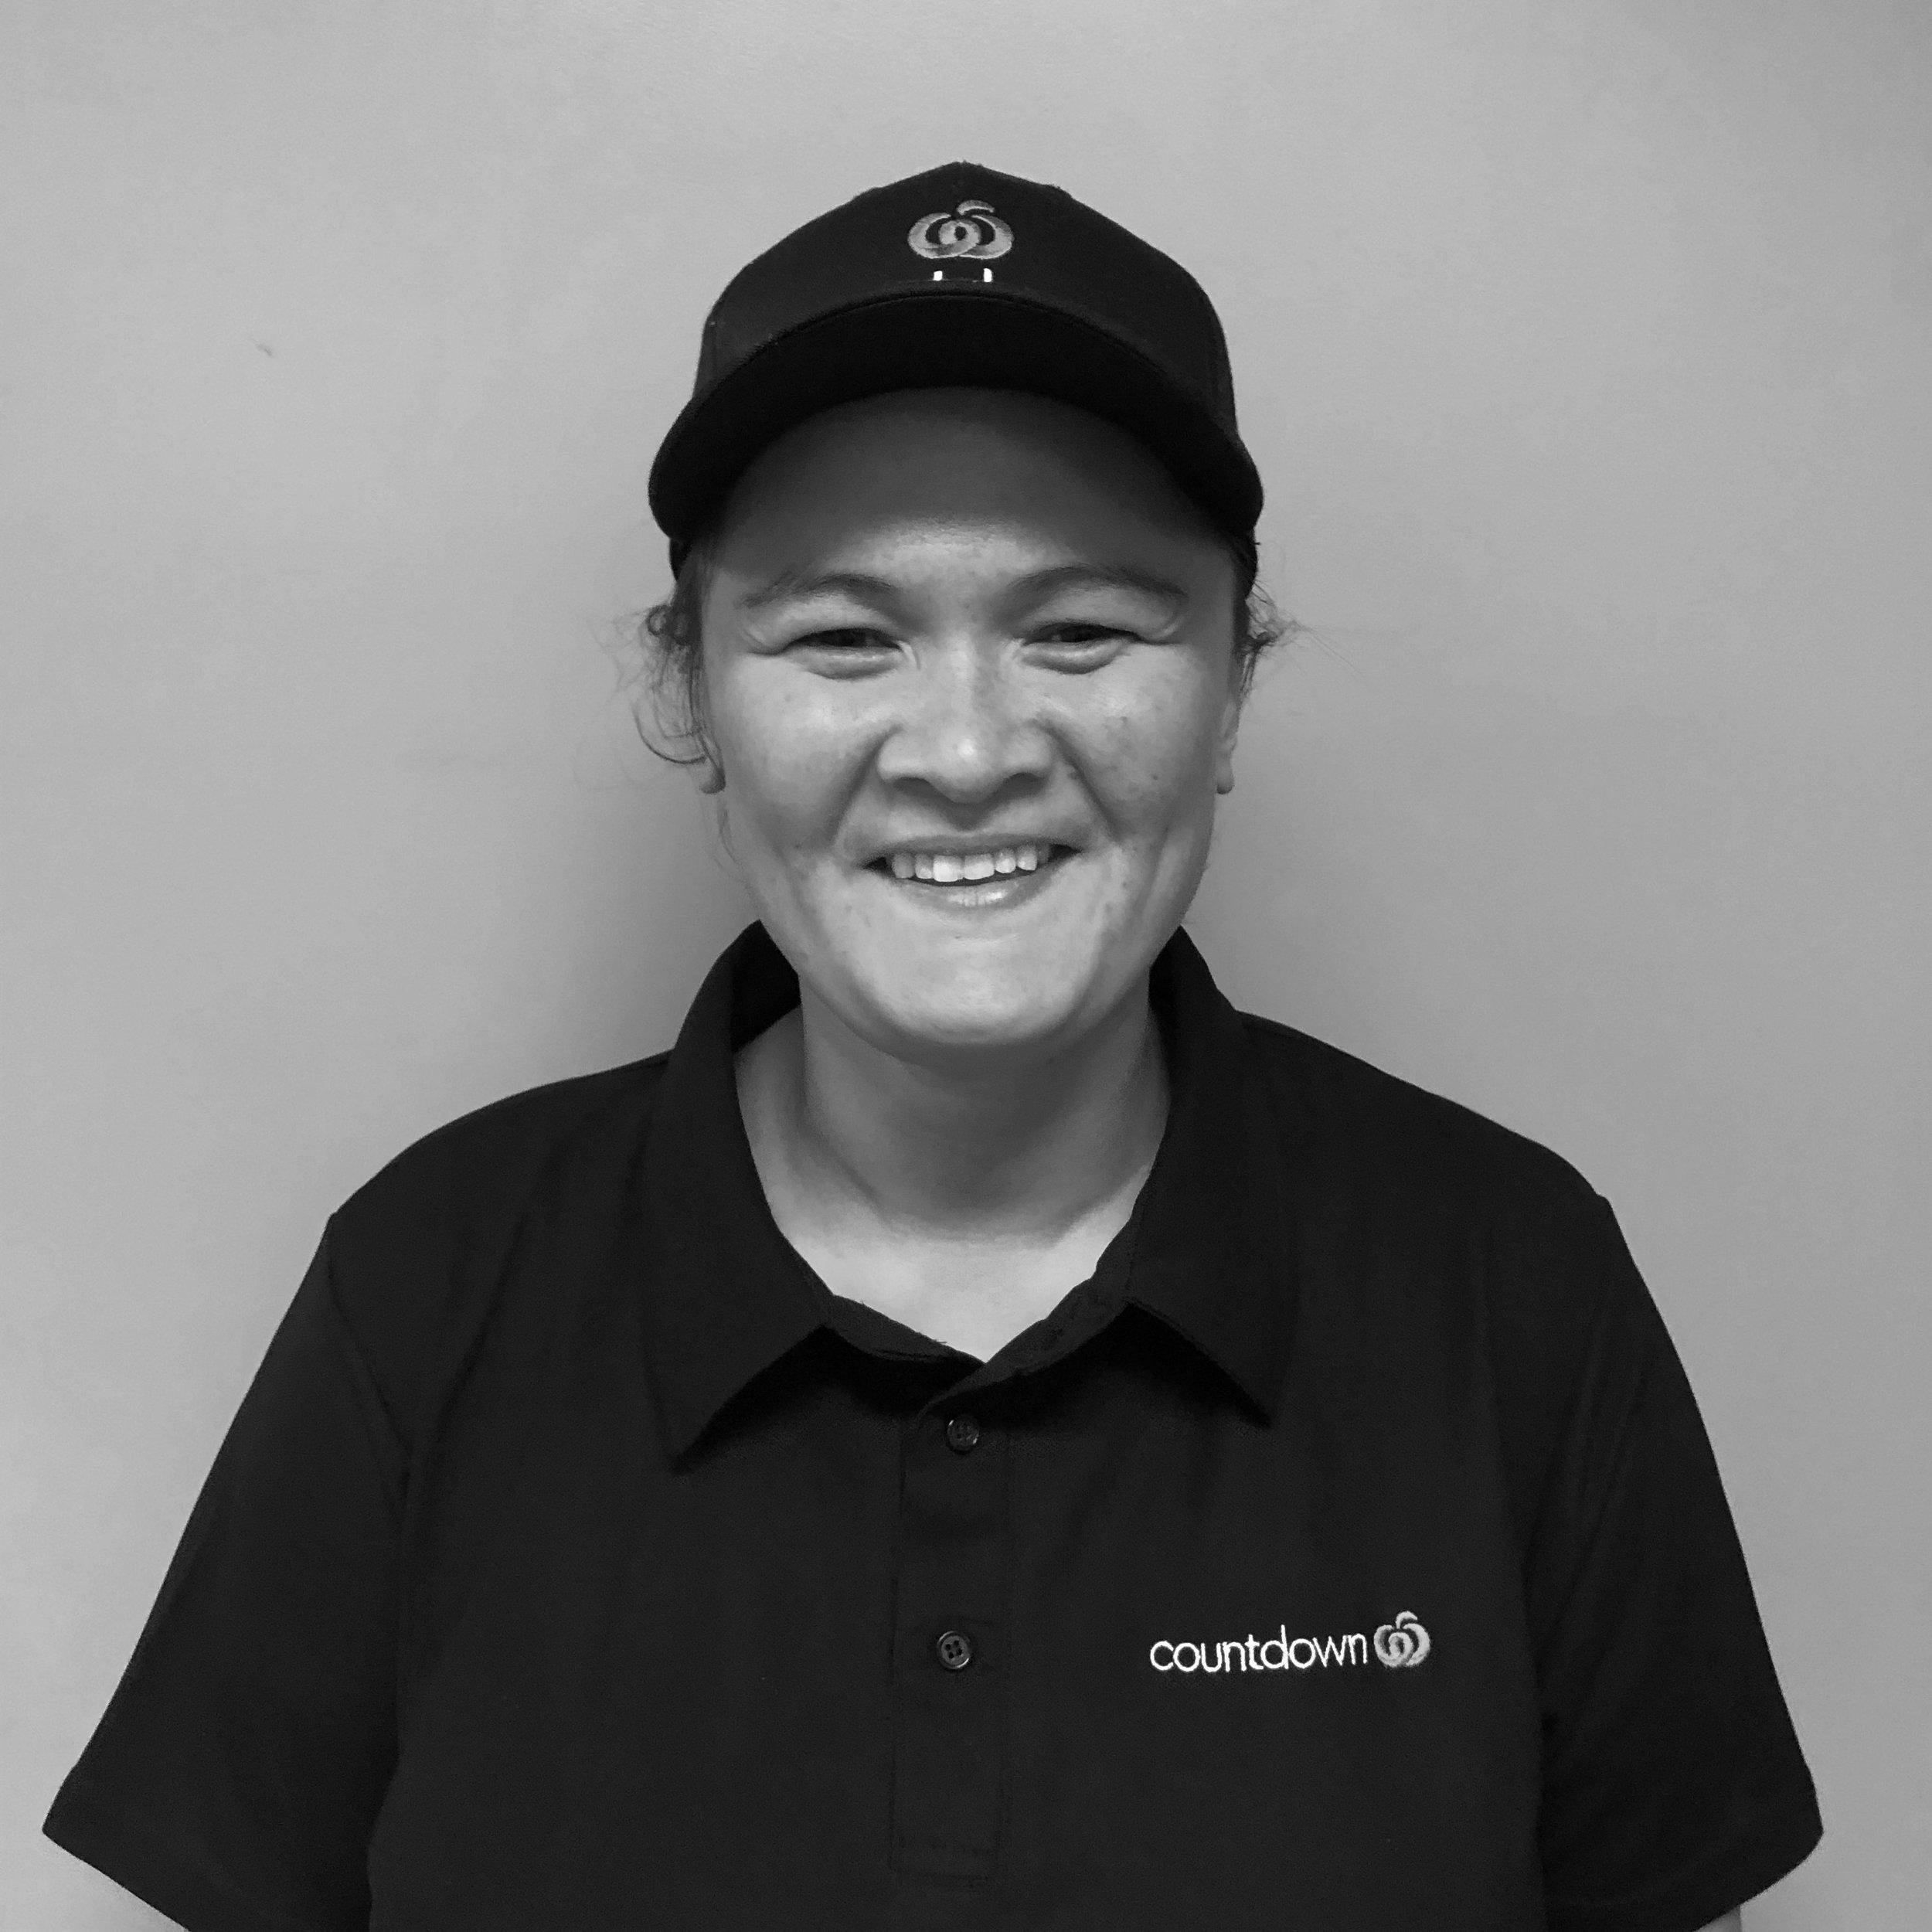 Cherise Redden - Countdown Meat & Seafood - AucklandUPPER NORTH ISLAND REGIONAL JOINT WINNER